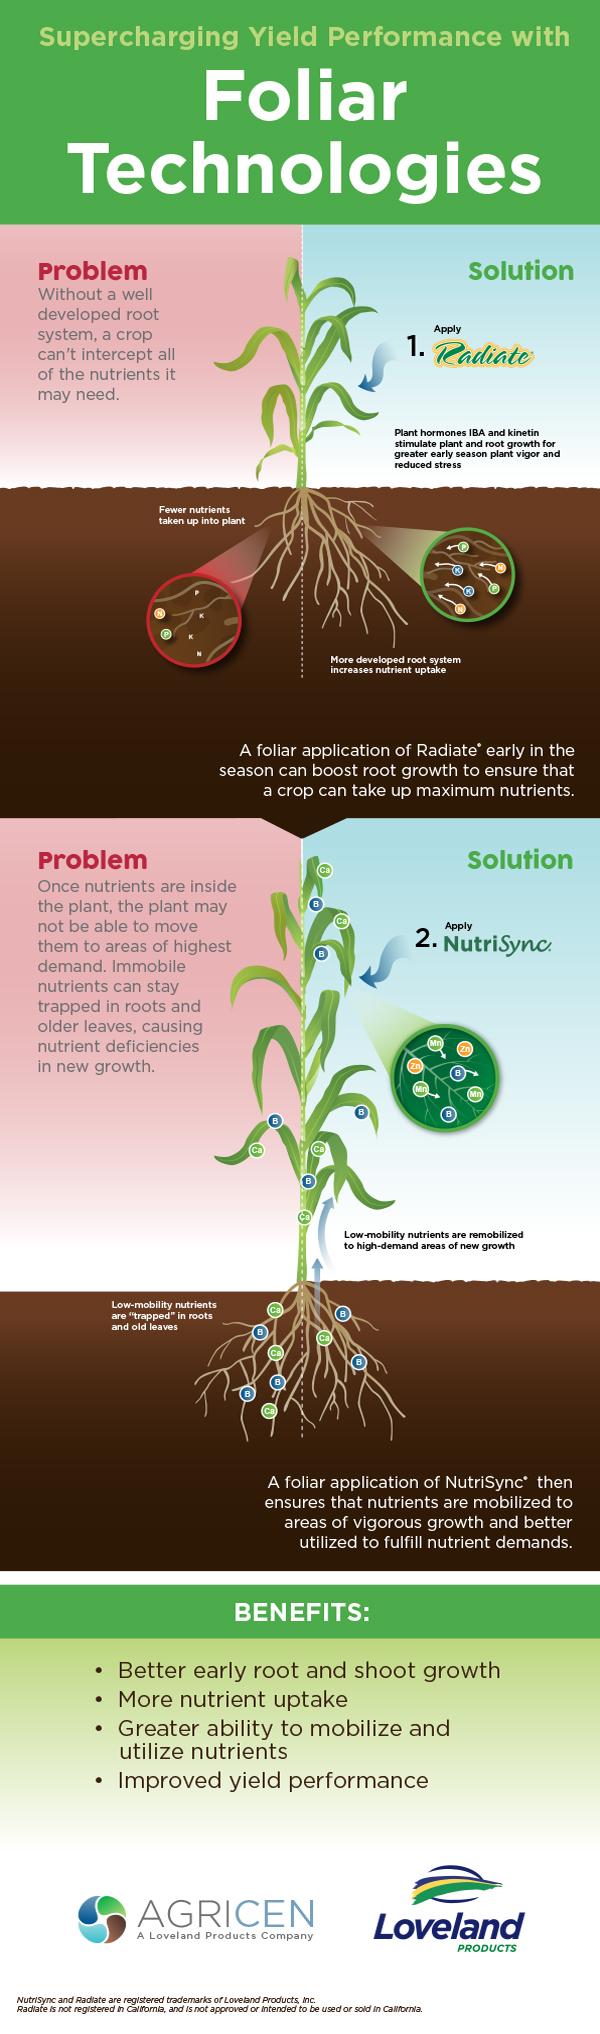 04-15-foliar-technologies-infographic-v4